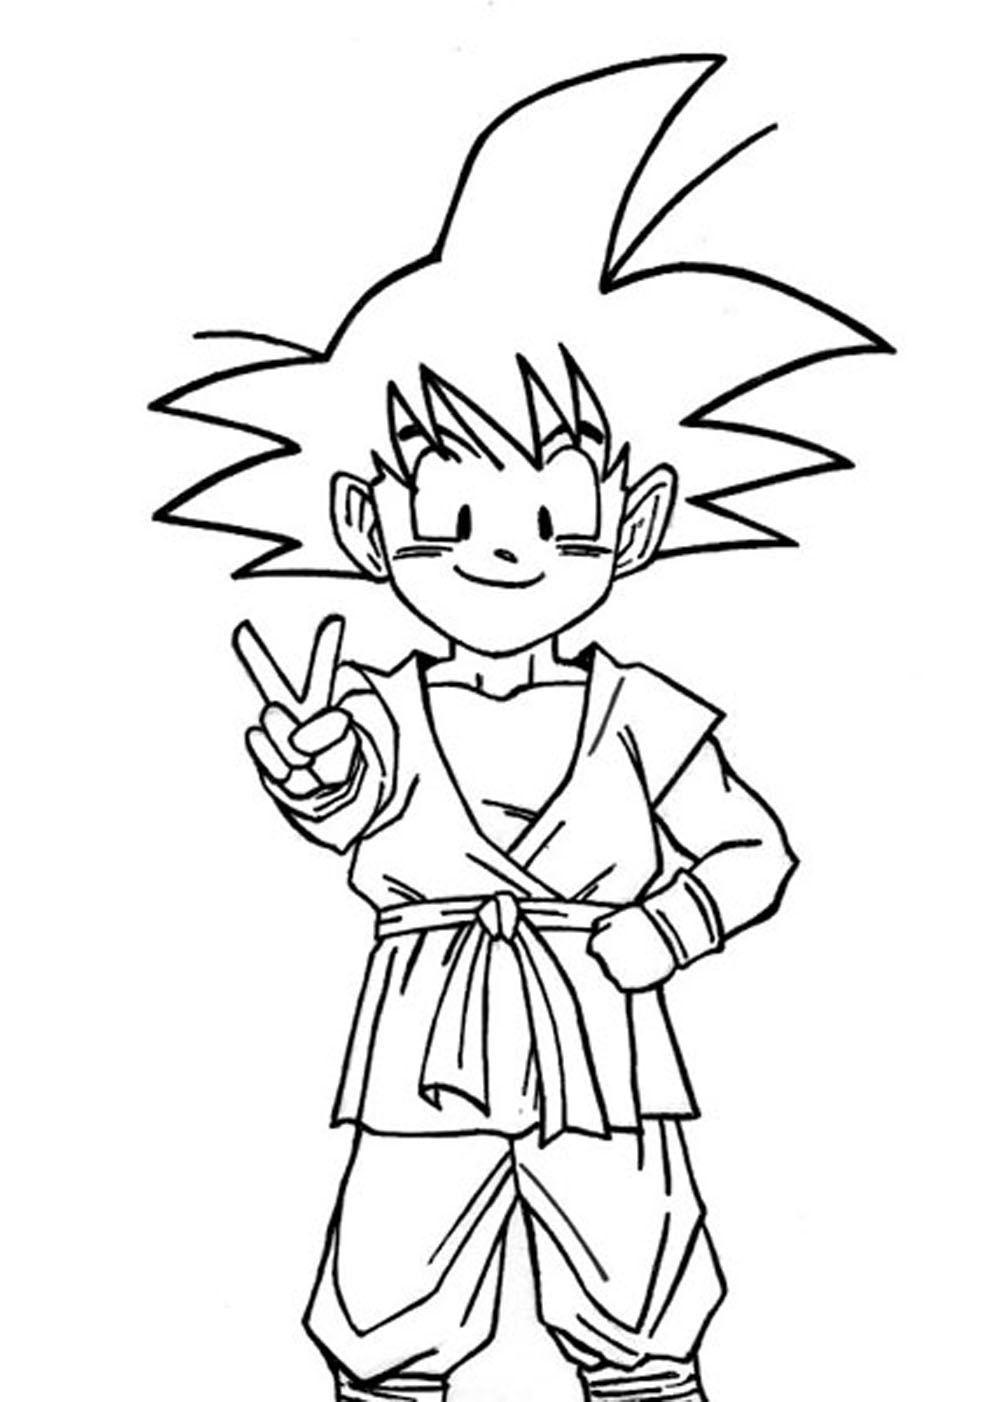 1000x1402 Imagen De Goku Dragon Ball Gt Pra Y Sketches, Art, Goku